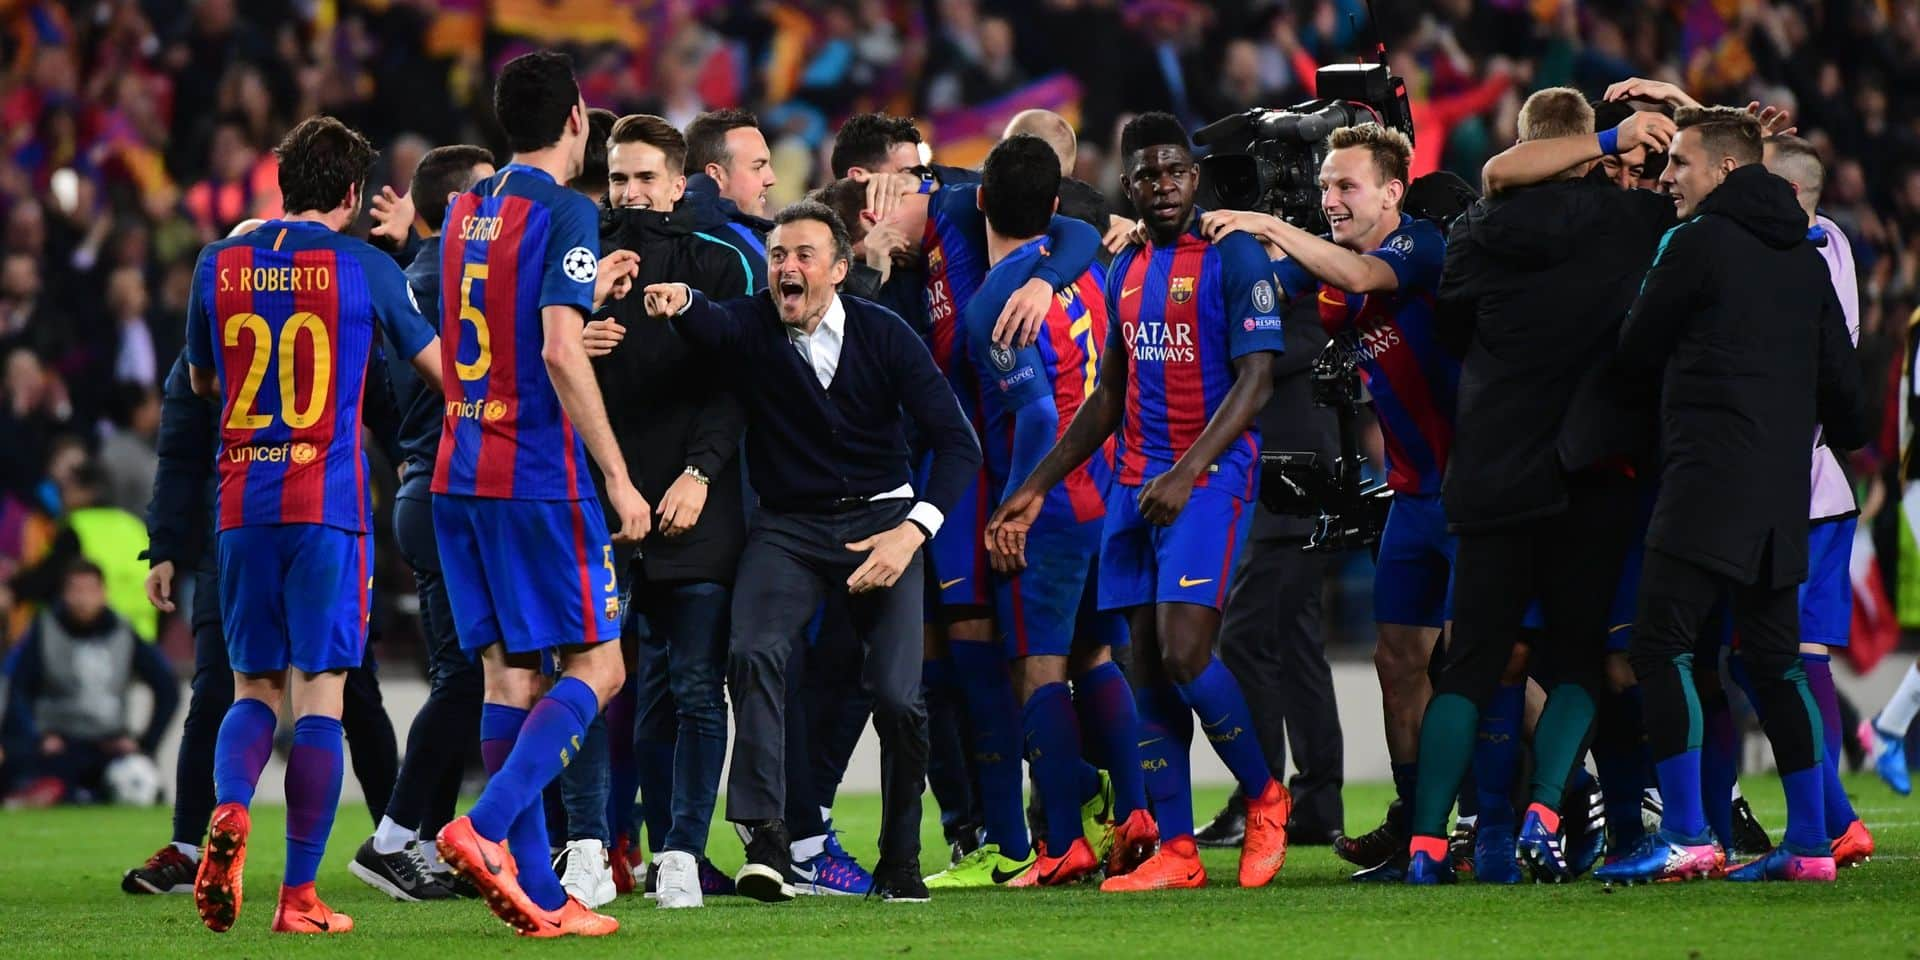 La belle anecdote de Robert Moreno lors de la remontada du Barça contre le PSG